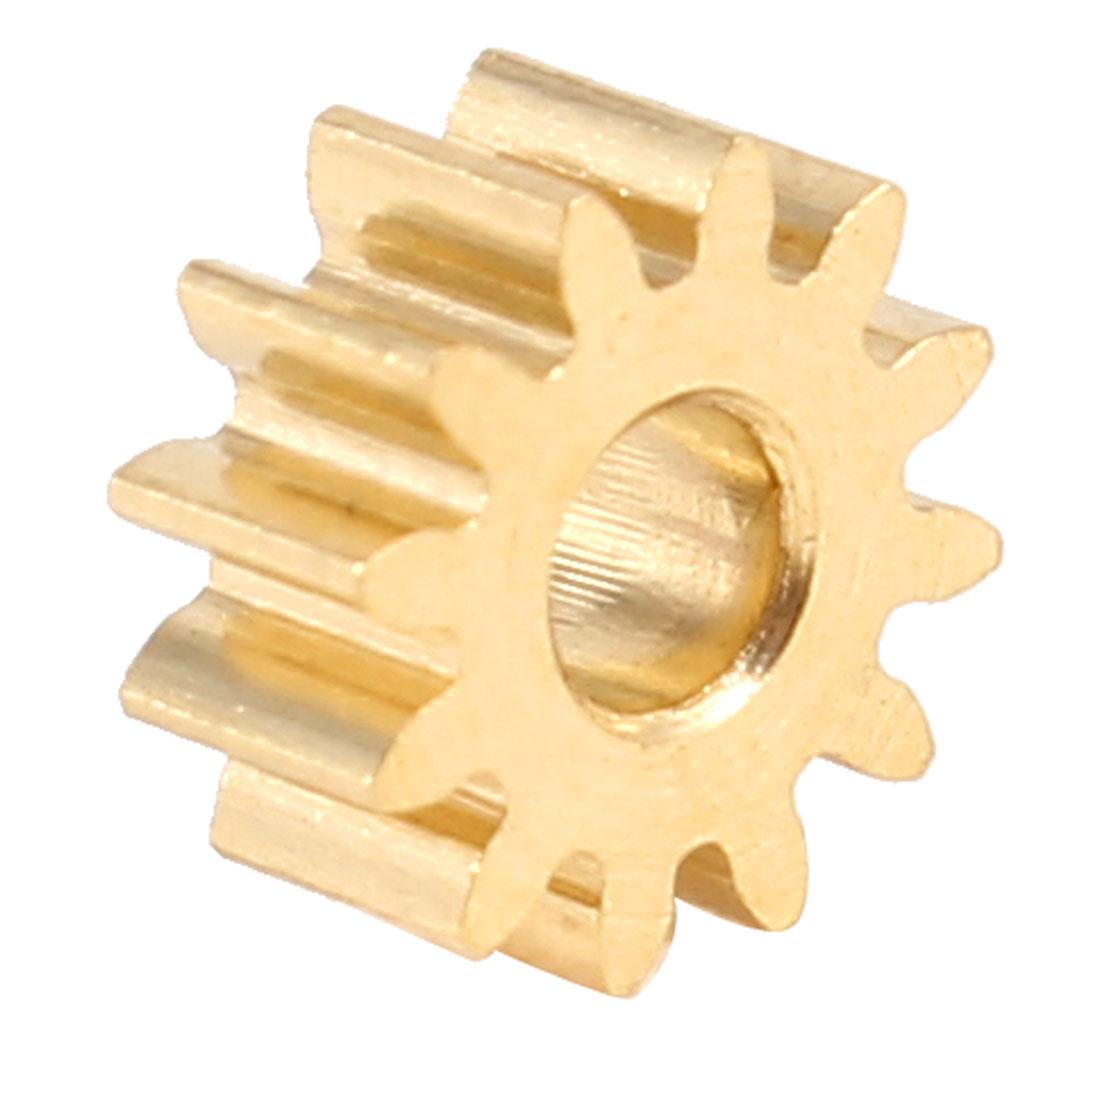 M0.4x12T 12 Teeth 2mm Dia Shaft Hole DC Gearbox Motor Drive Gear Gold Tone